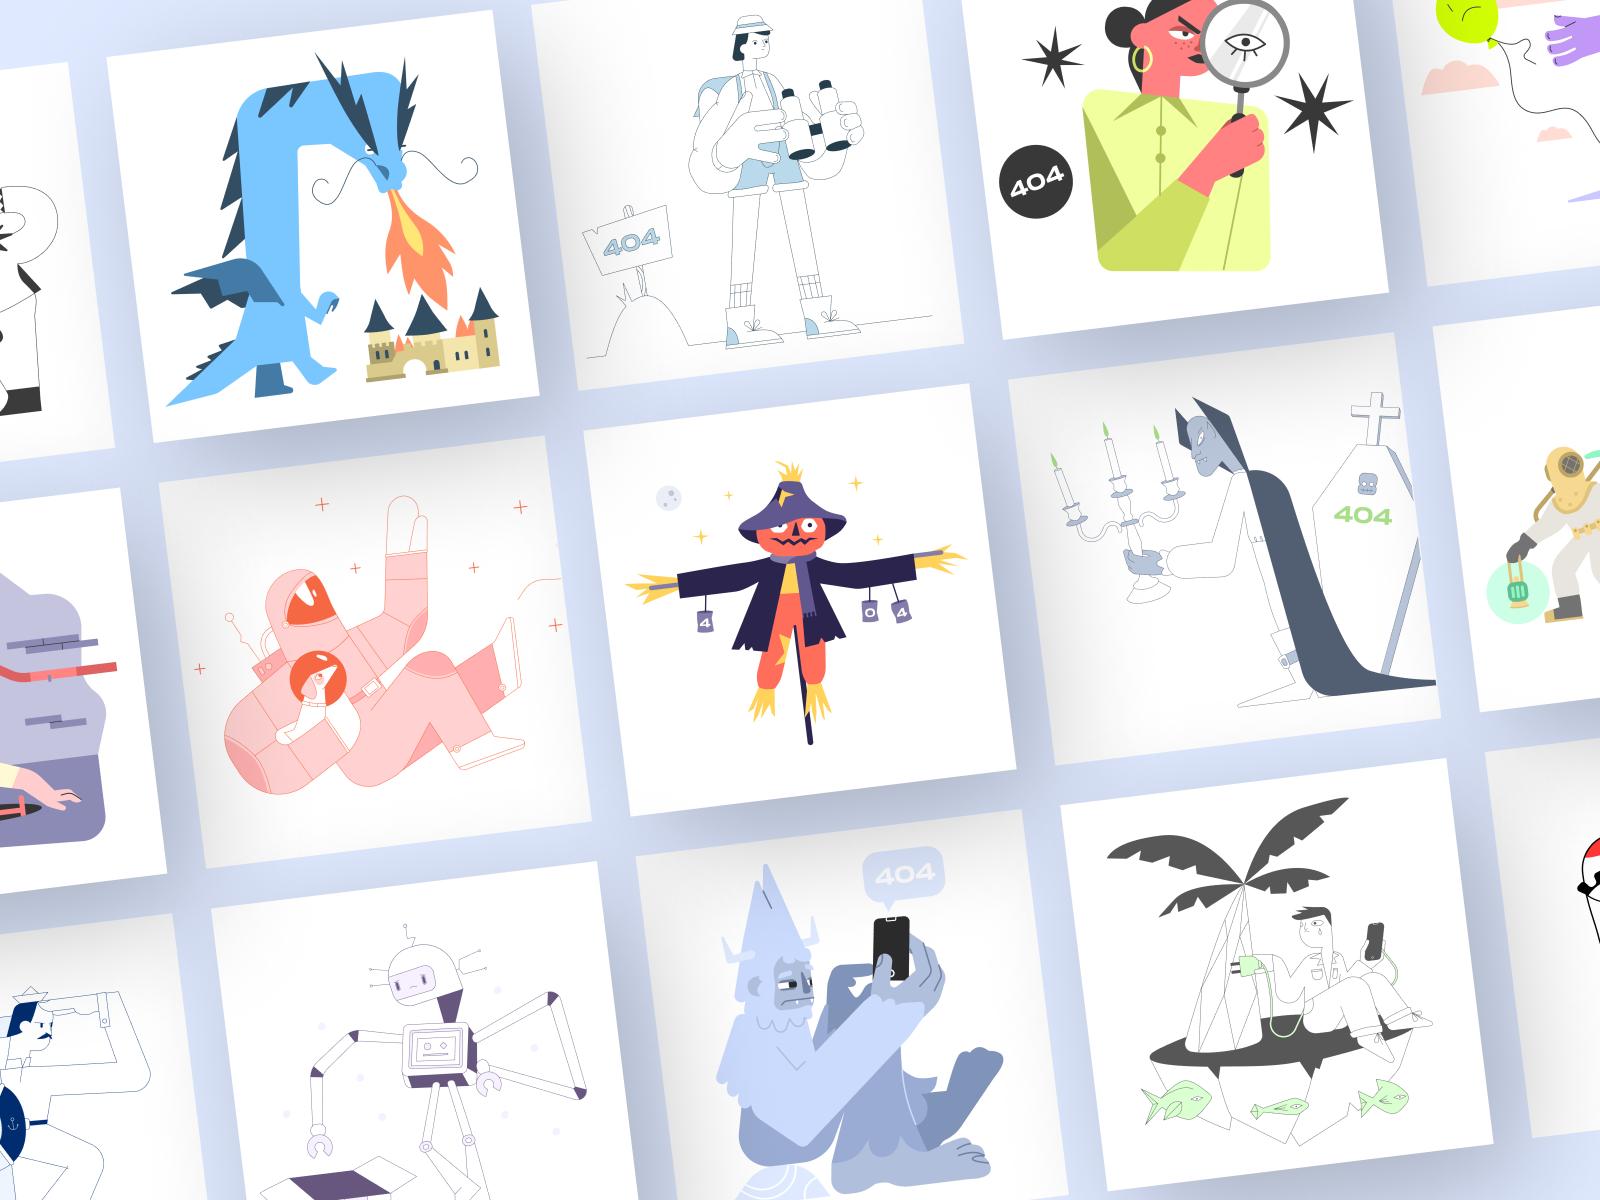 Error 404 Illustrations cover image